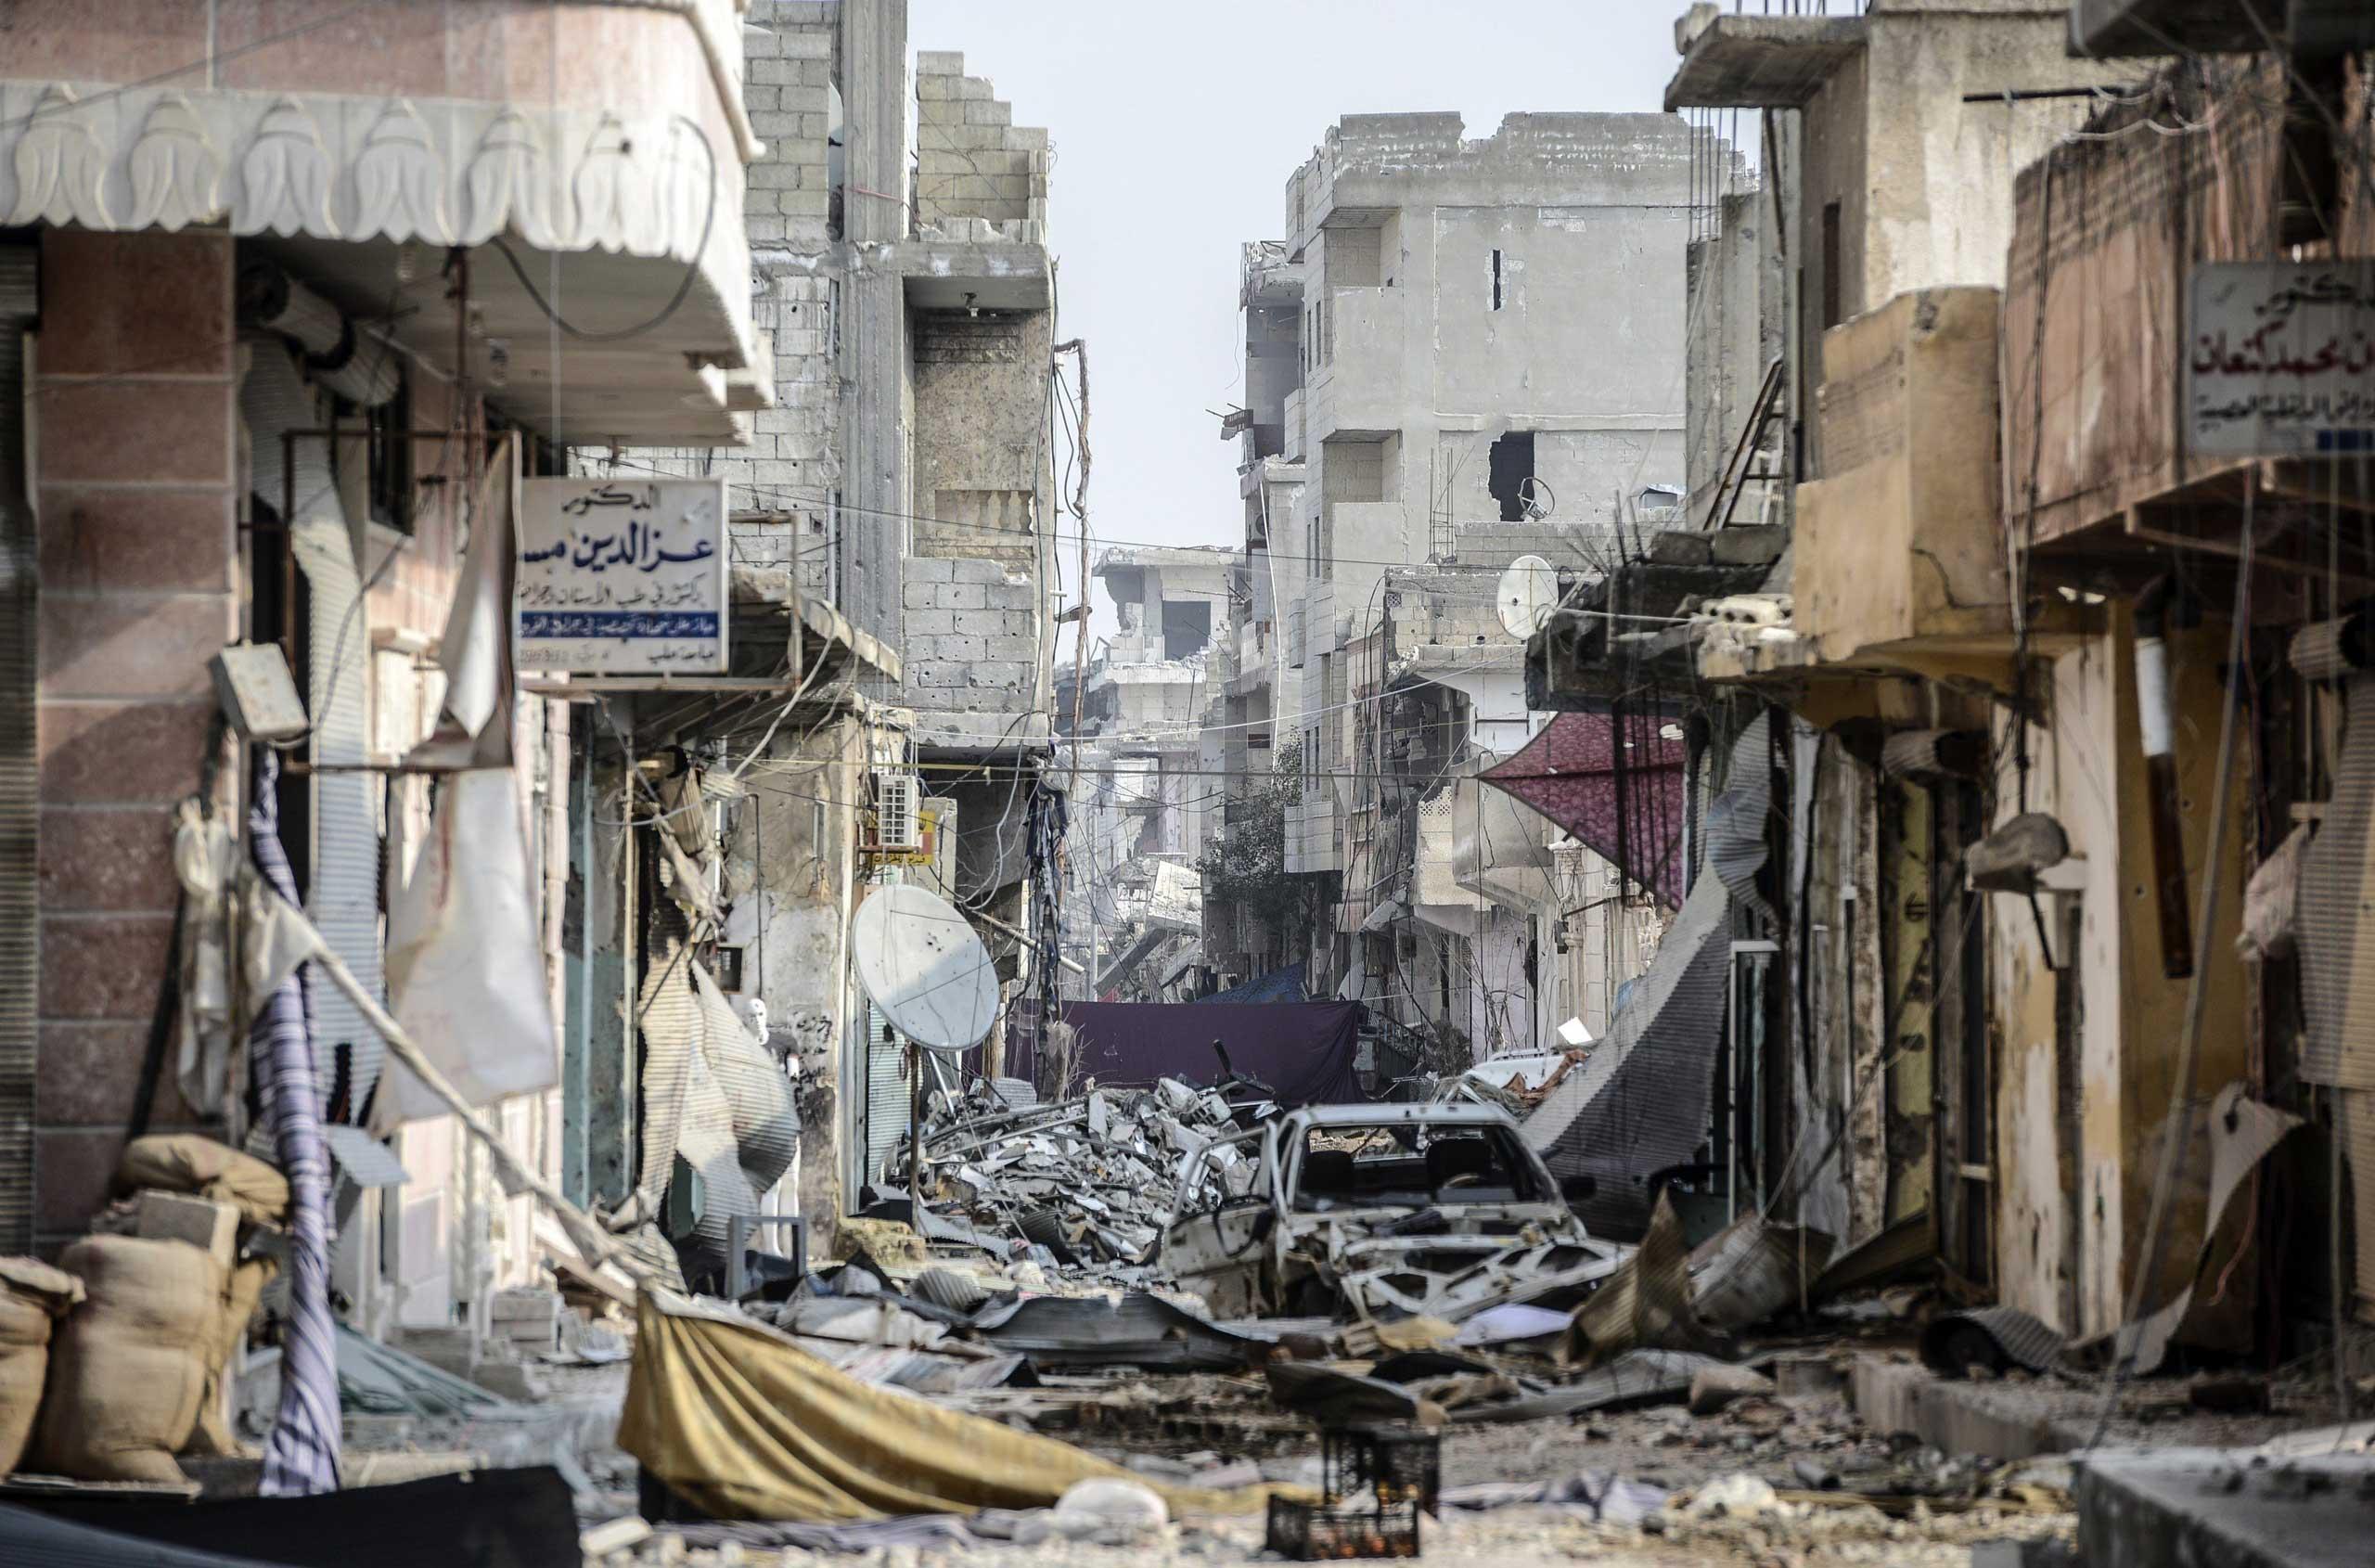 Street scene in Kobani on Jan. 28, 2015.